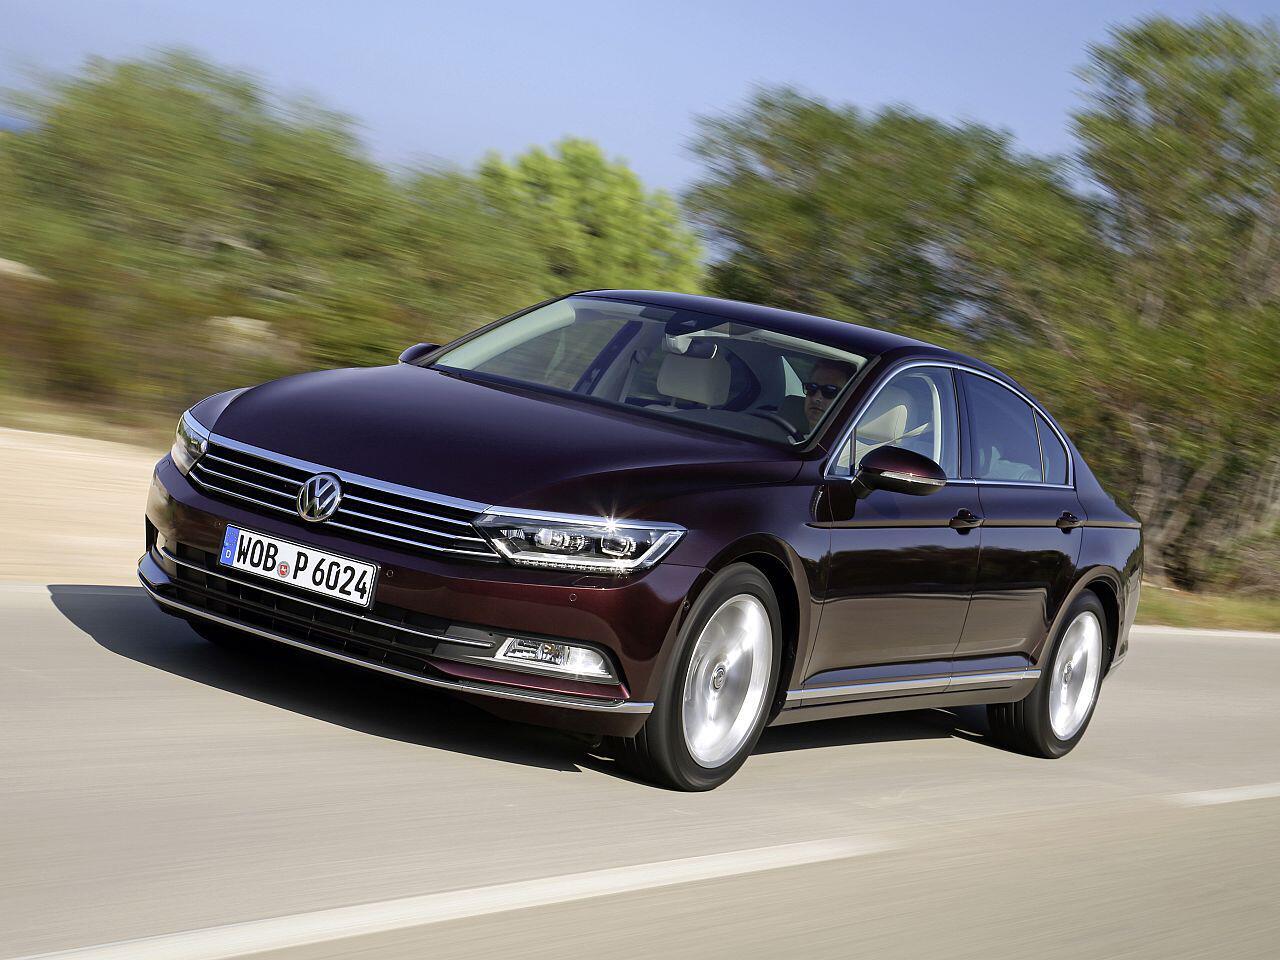 Bild zu Platz 7: VW Passat